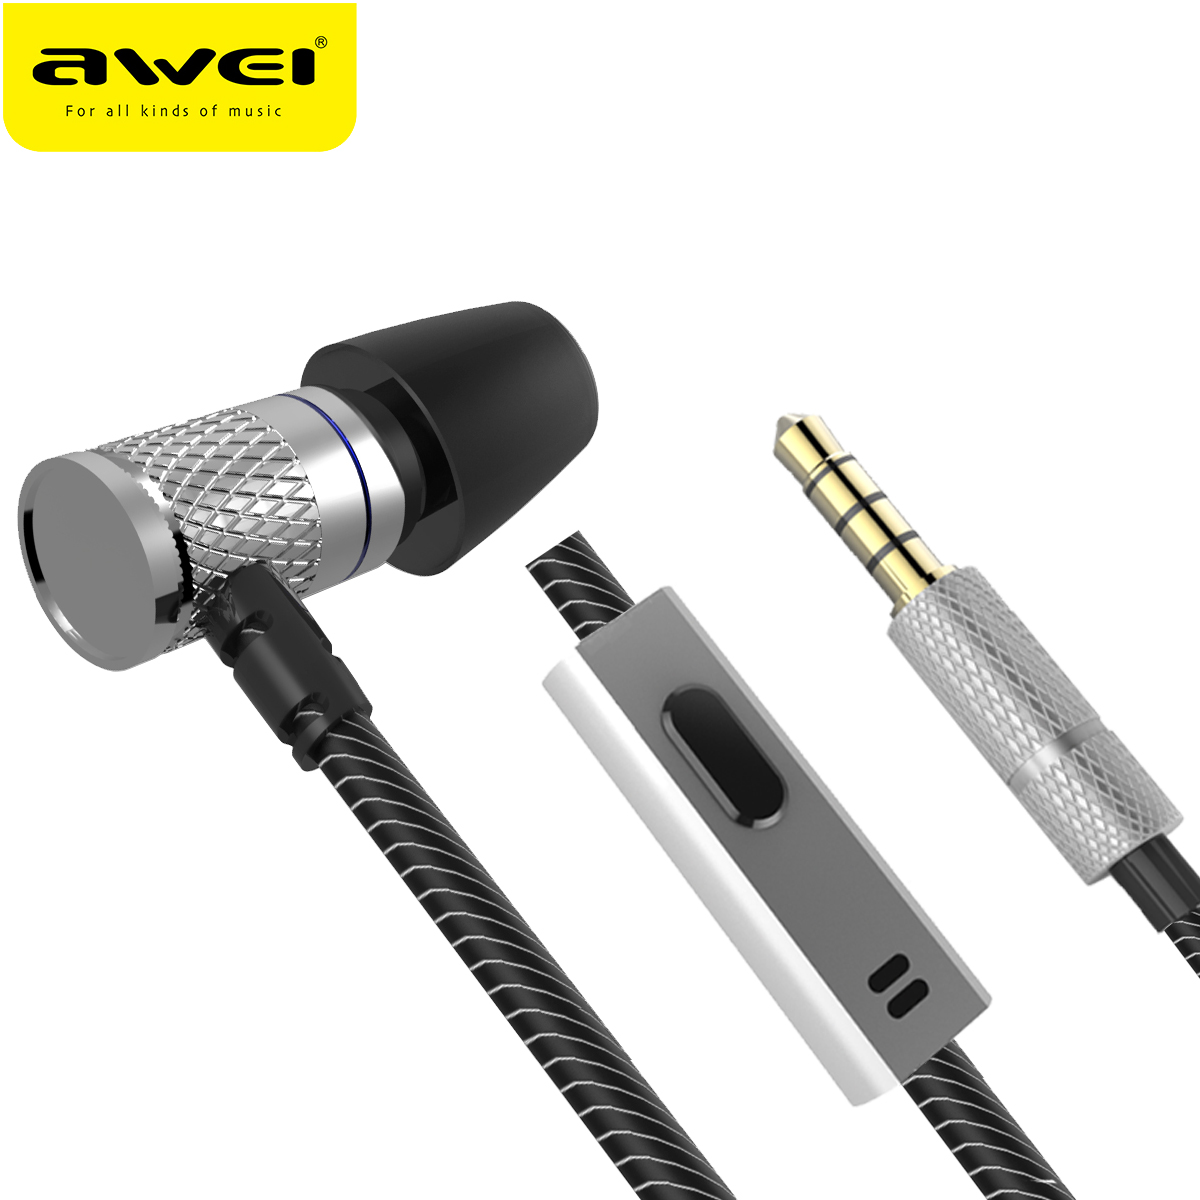 AWEI ES-660I mini Kopfhörer Mit Mikrofon Metall Headset HIFI fone de ouvido Audifonos Casque Für iPhone Samsung Huawei Handys